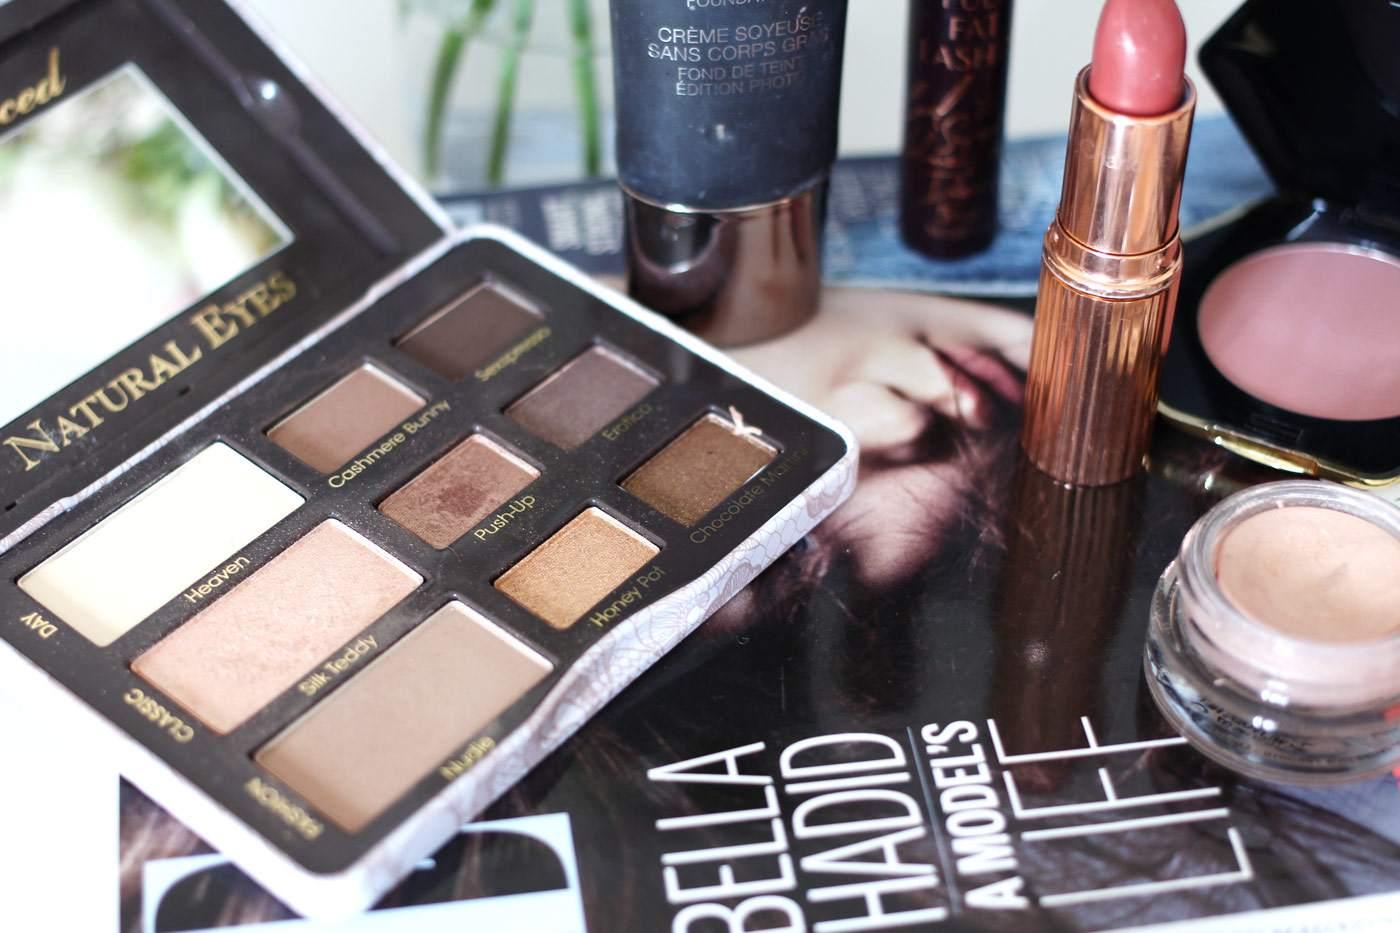 makeup-favourites-charlotte-tilbury-laura-mercier-too-faced-1